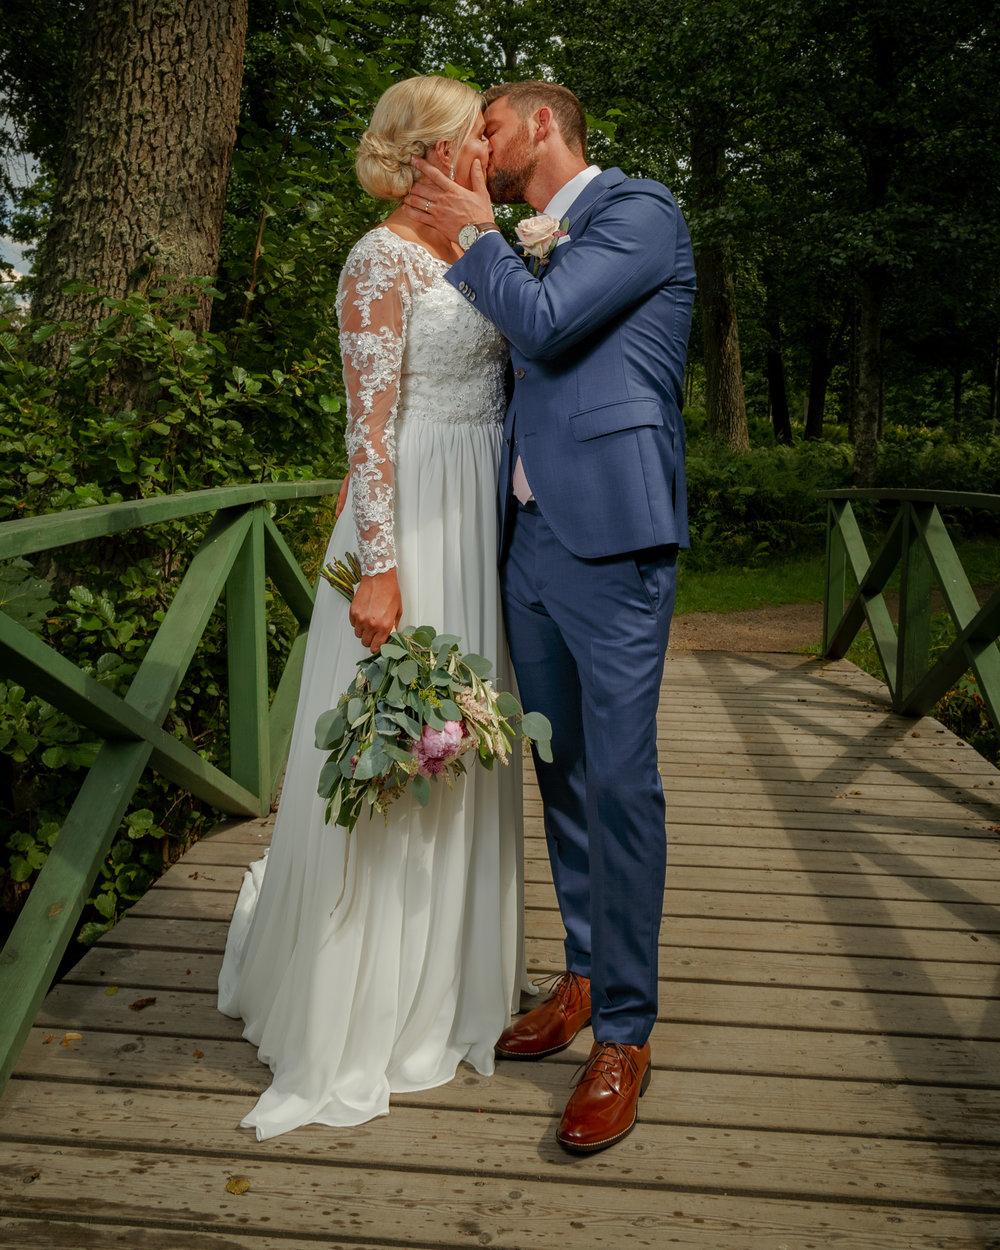 20180714-örebro-bröllop-295.jpg